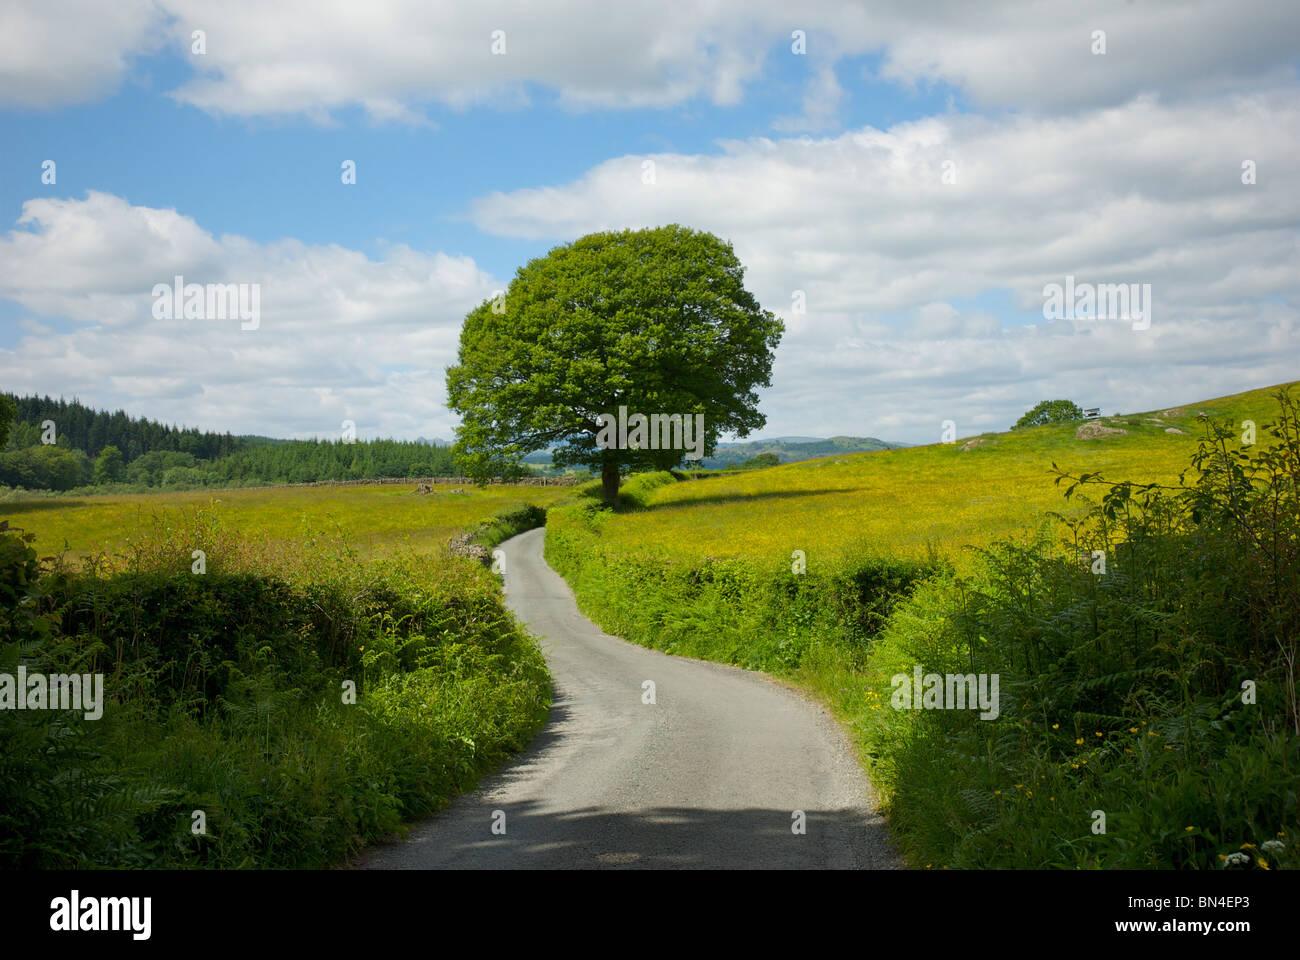 Route de campagne tranquille, Cumbria, Angleterre, Royaume-Uni Photo Stock